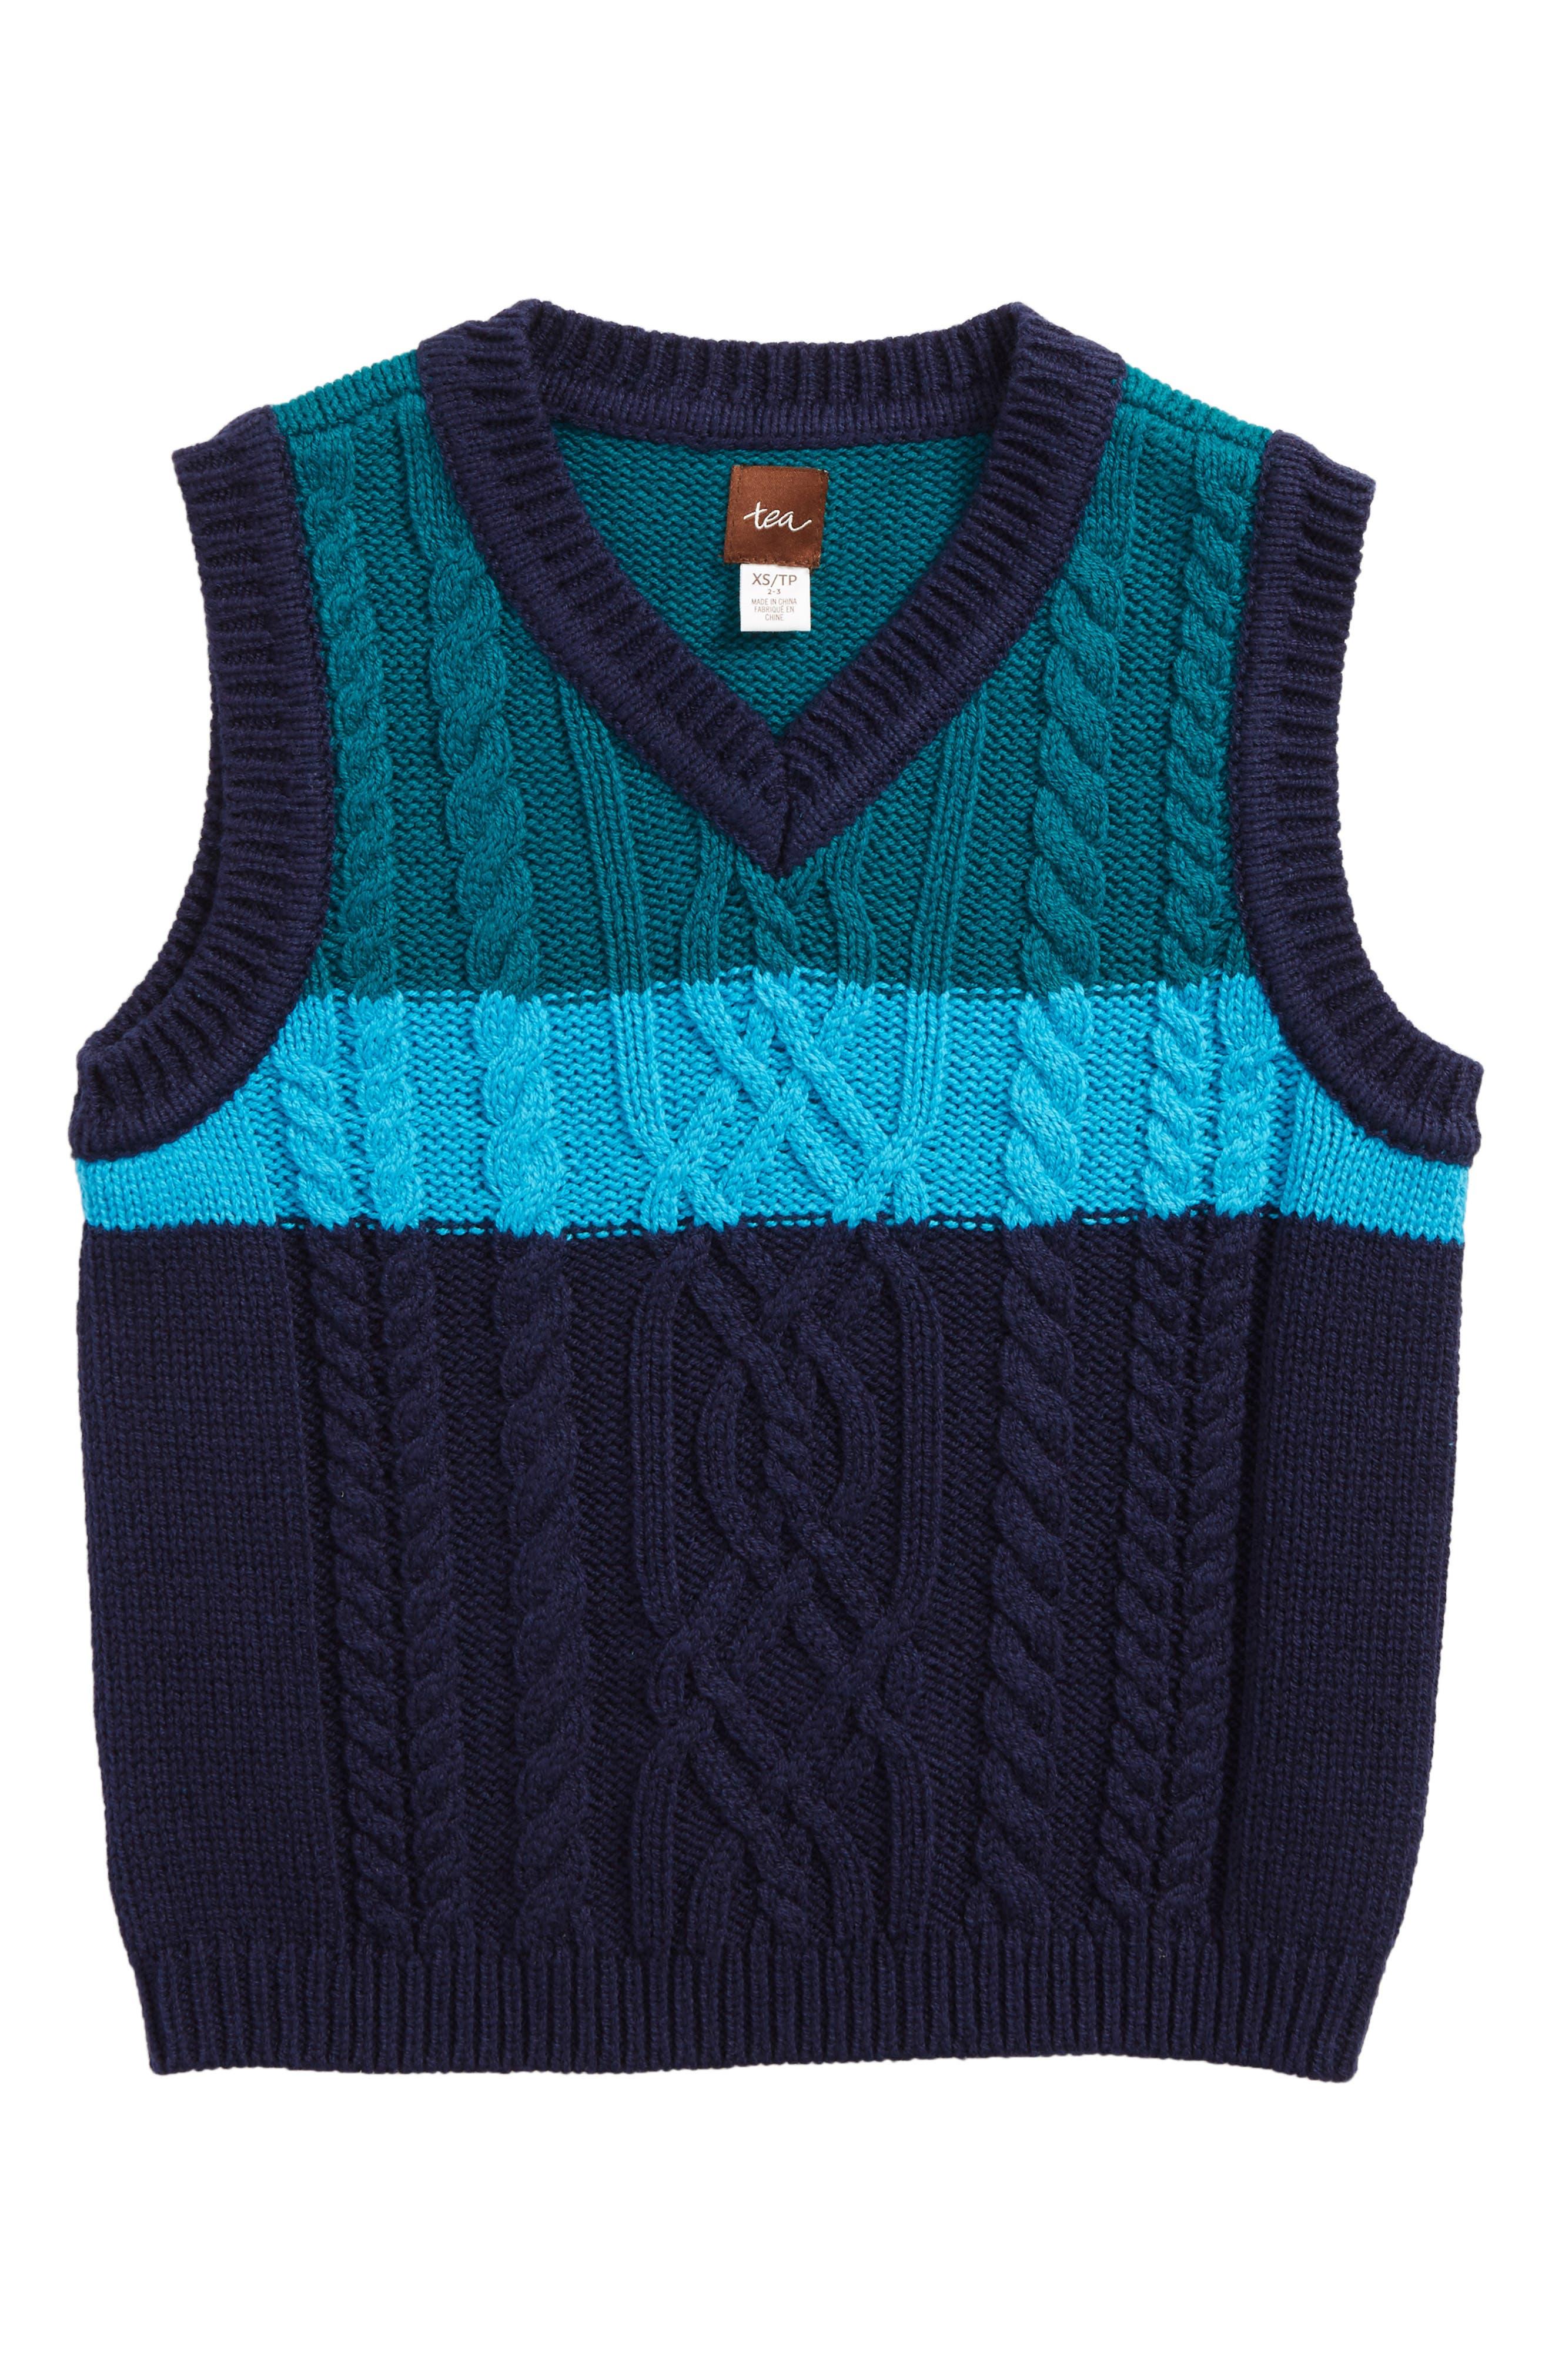 Main Image - Tea Collection Edan Cable Knit Sweater Vest (Toddler Boys, Little Boys & Big Boys)